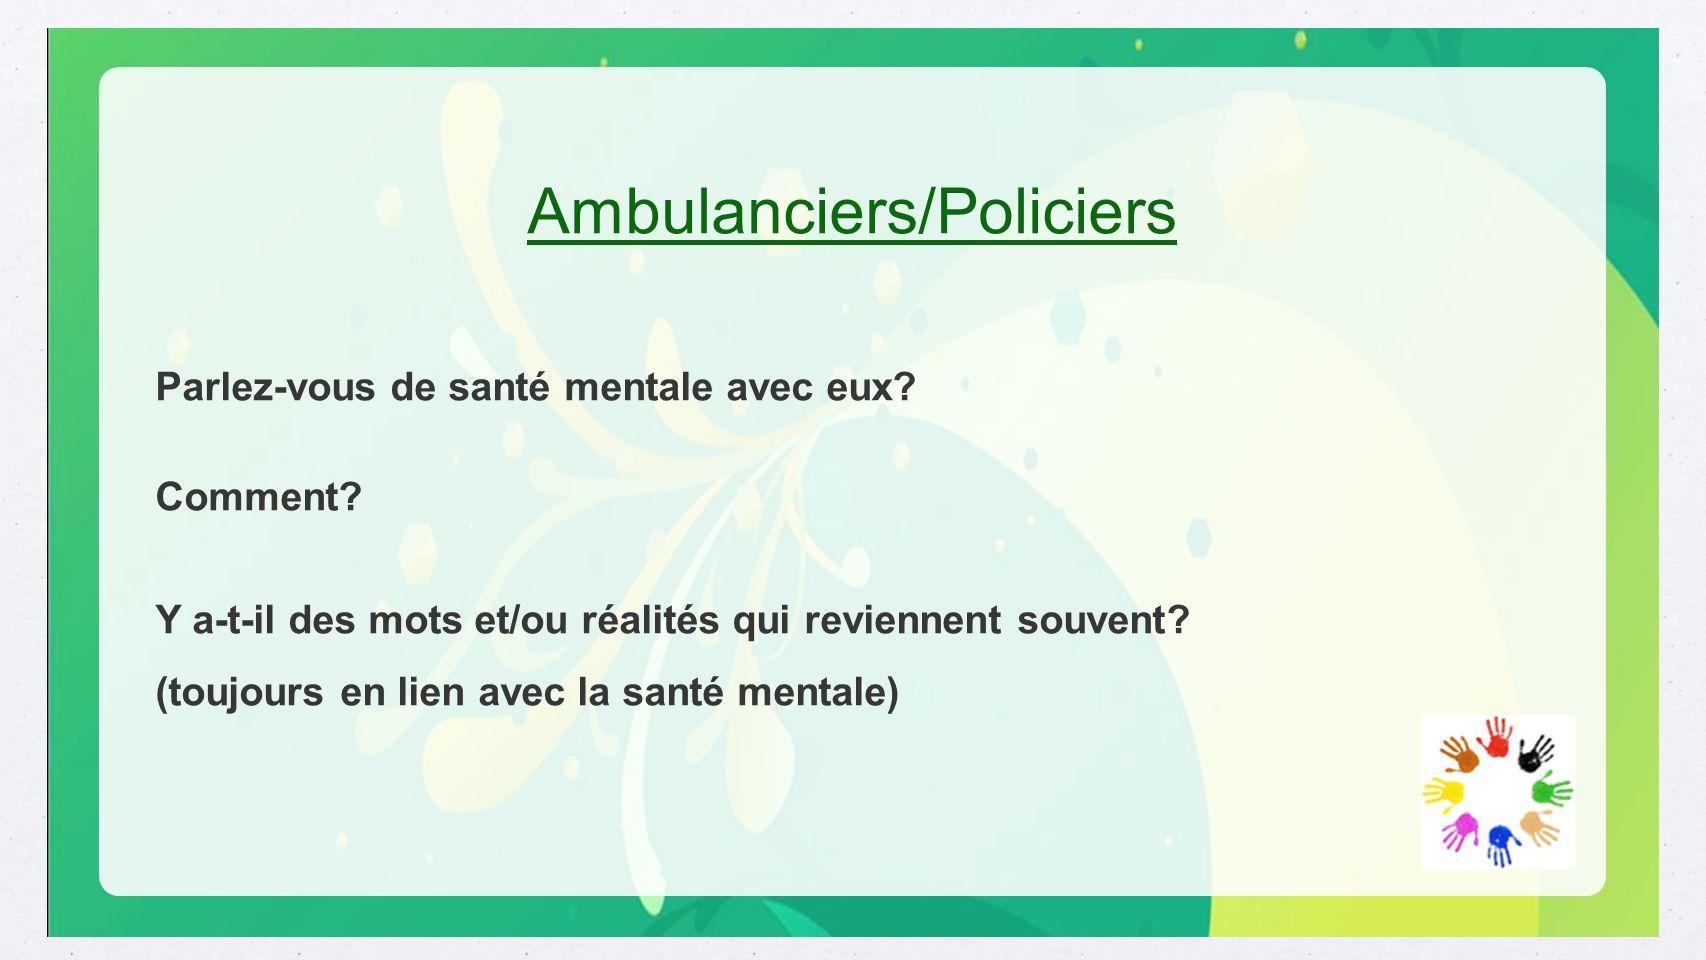 Ambulanciers/Policiers